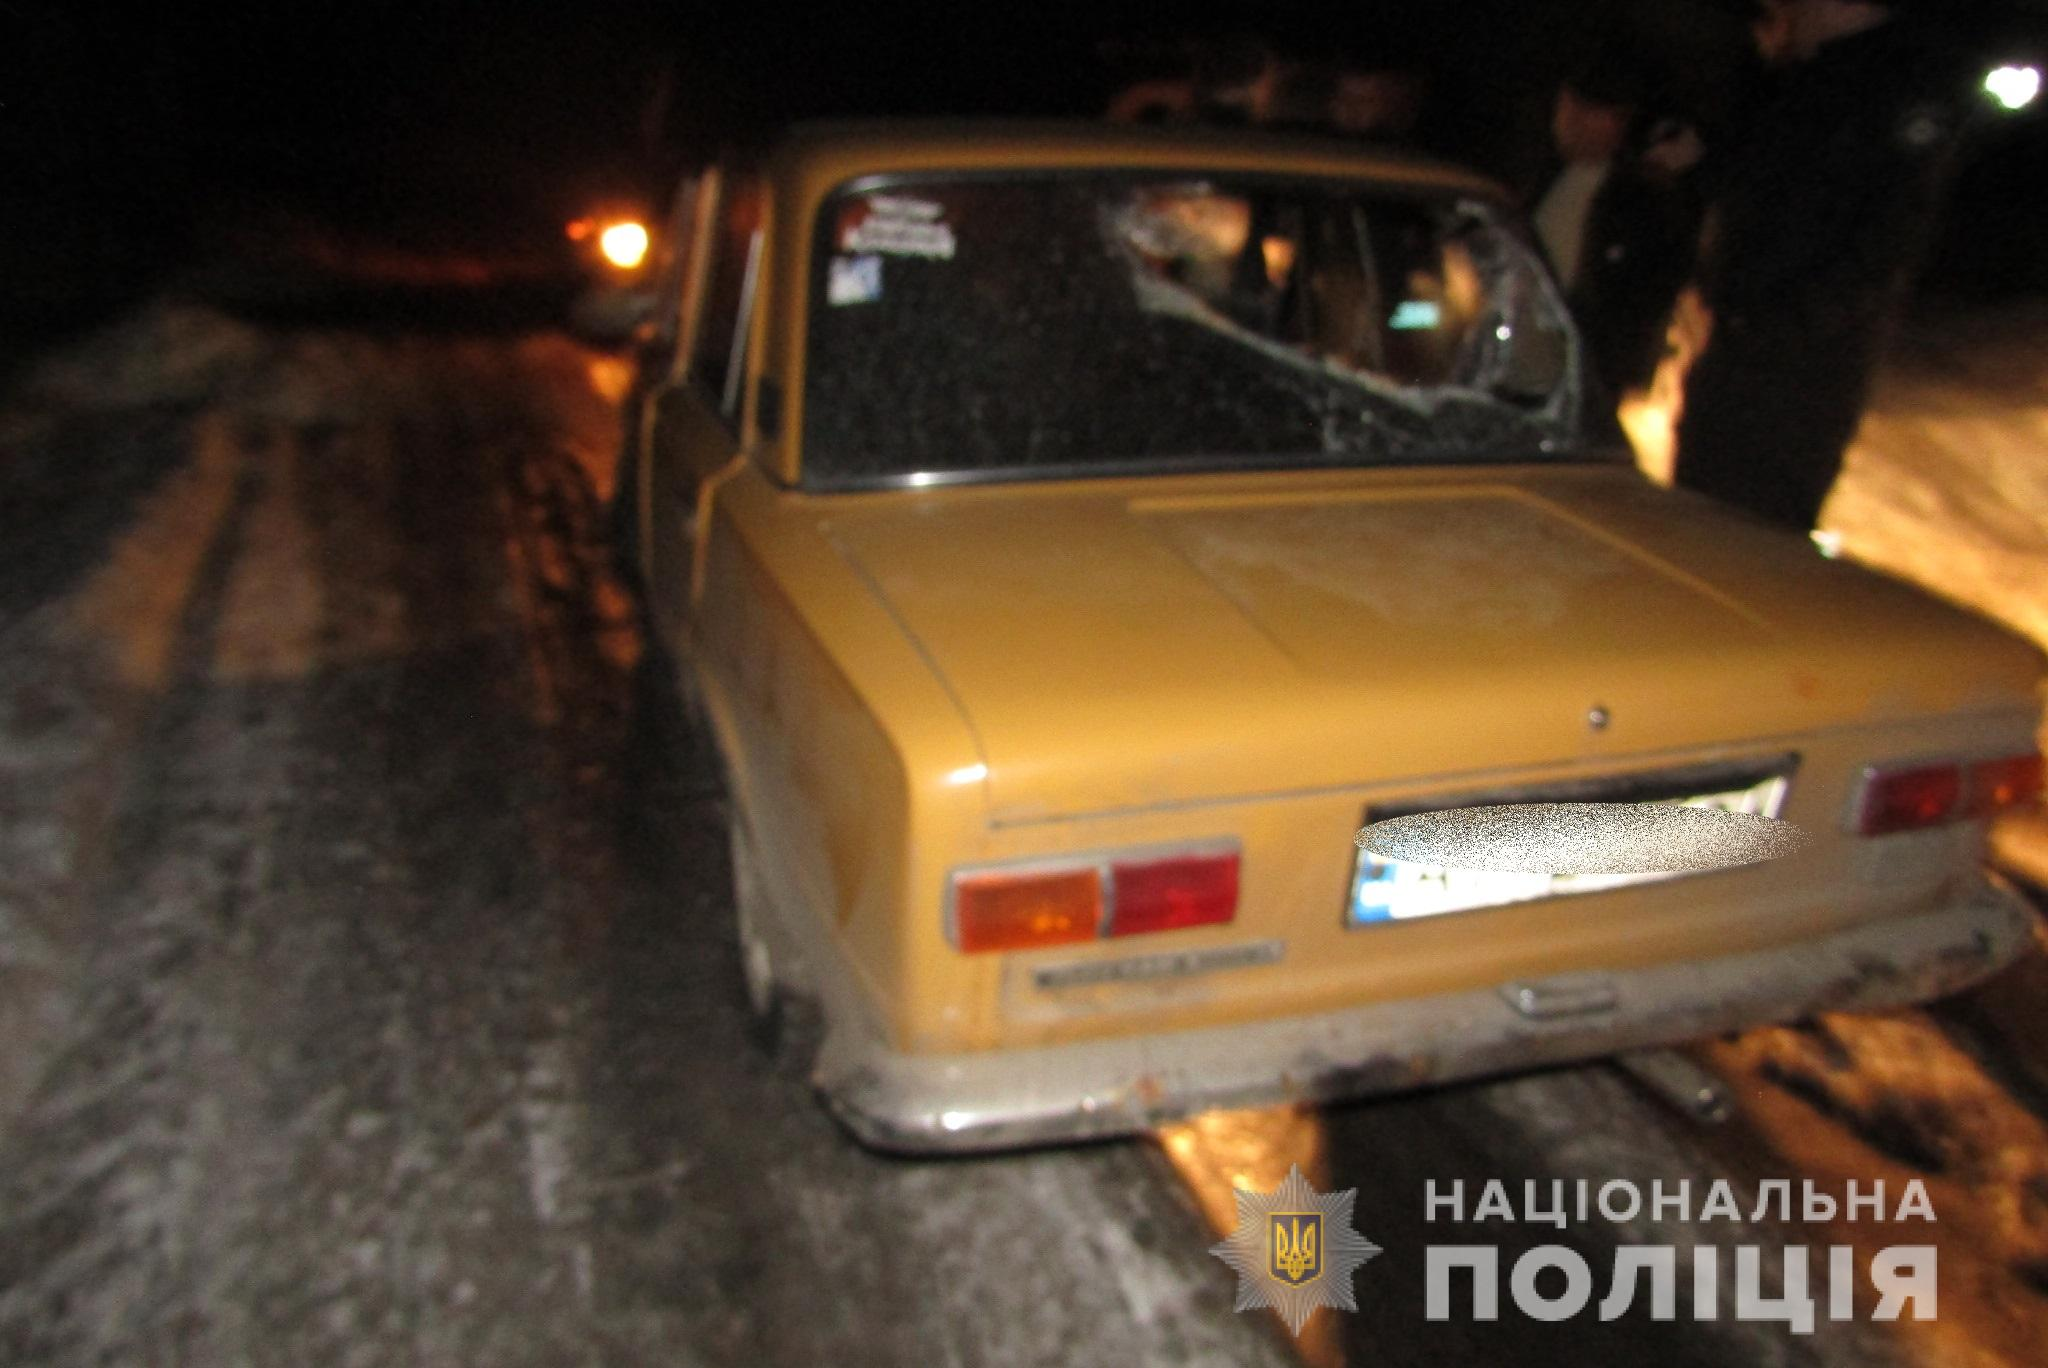 Горе-викрадача авто знайшли за 2 годин